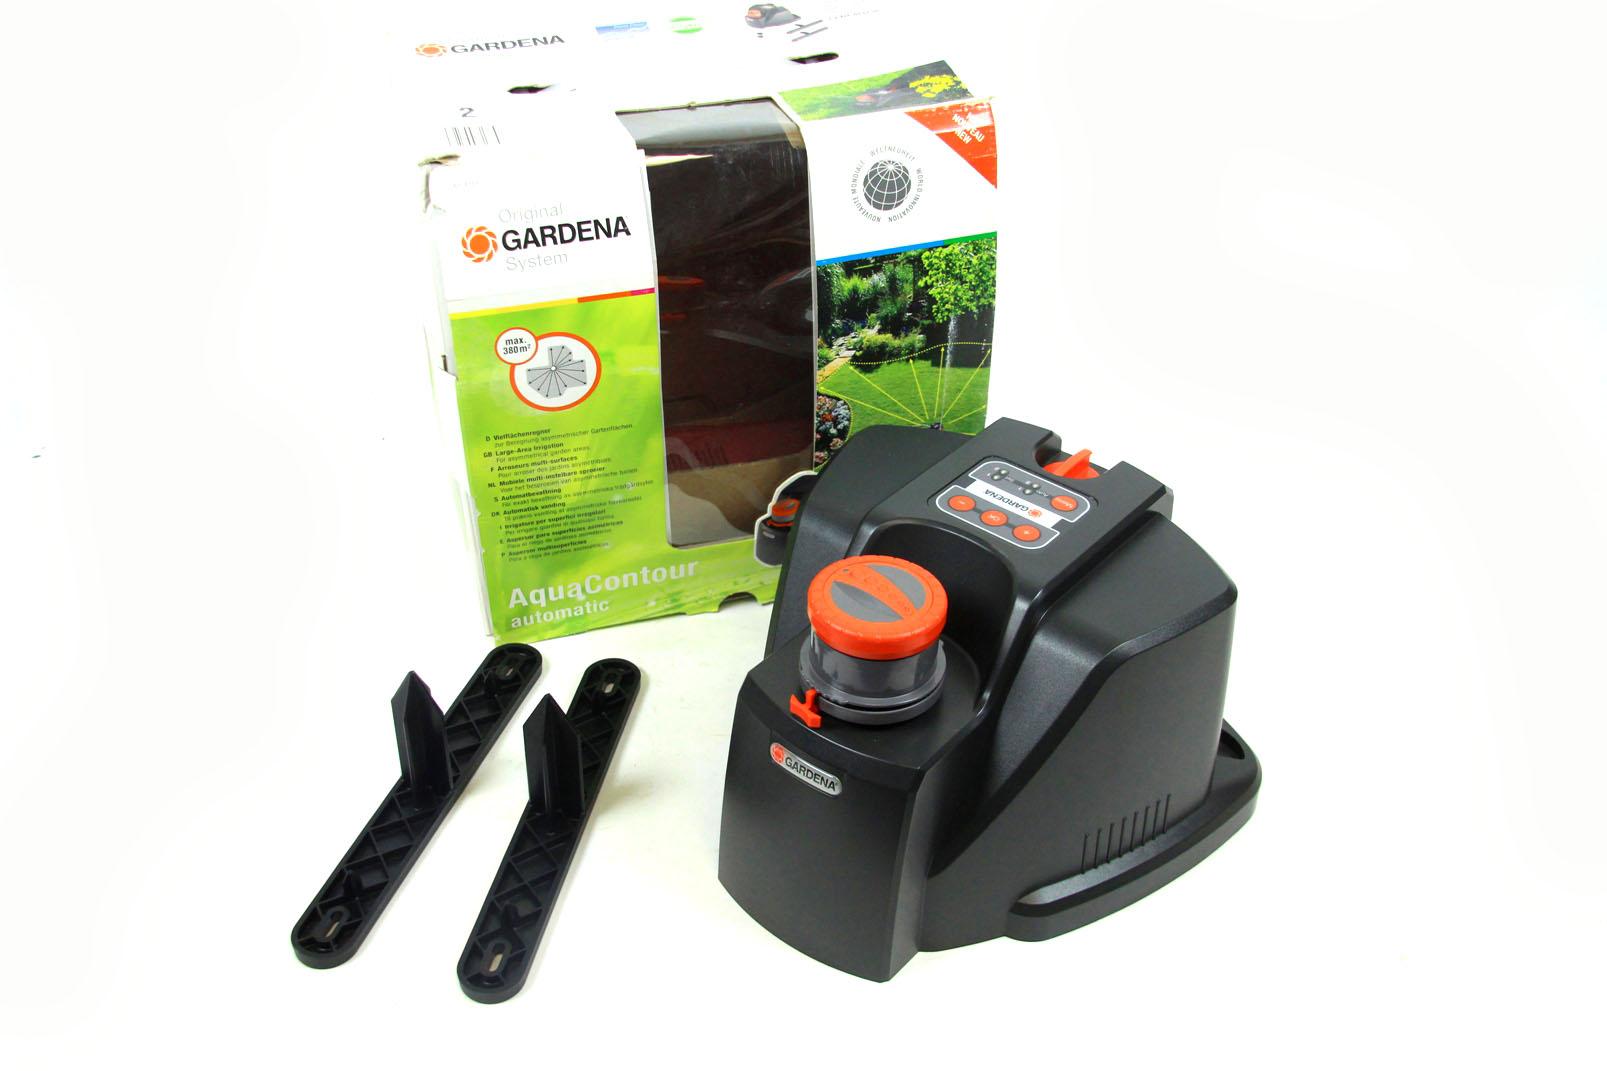 gardena aquacotour automatic 8133 vielfl chen regner garten bew sserung sprenger. Black Bedroom Furniture Sets. Home Design Ideas